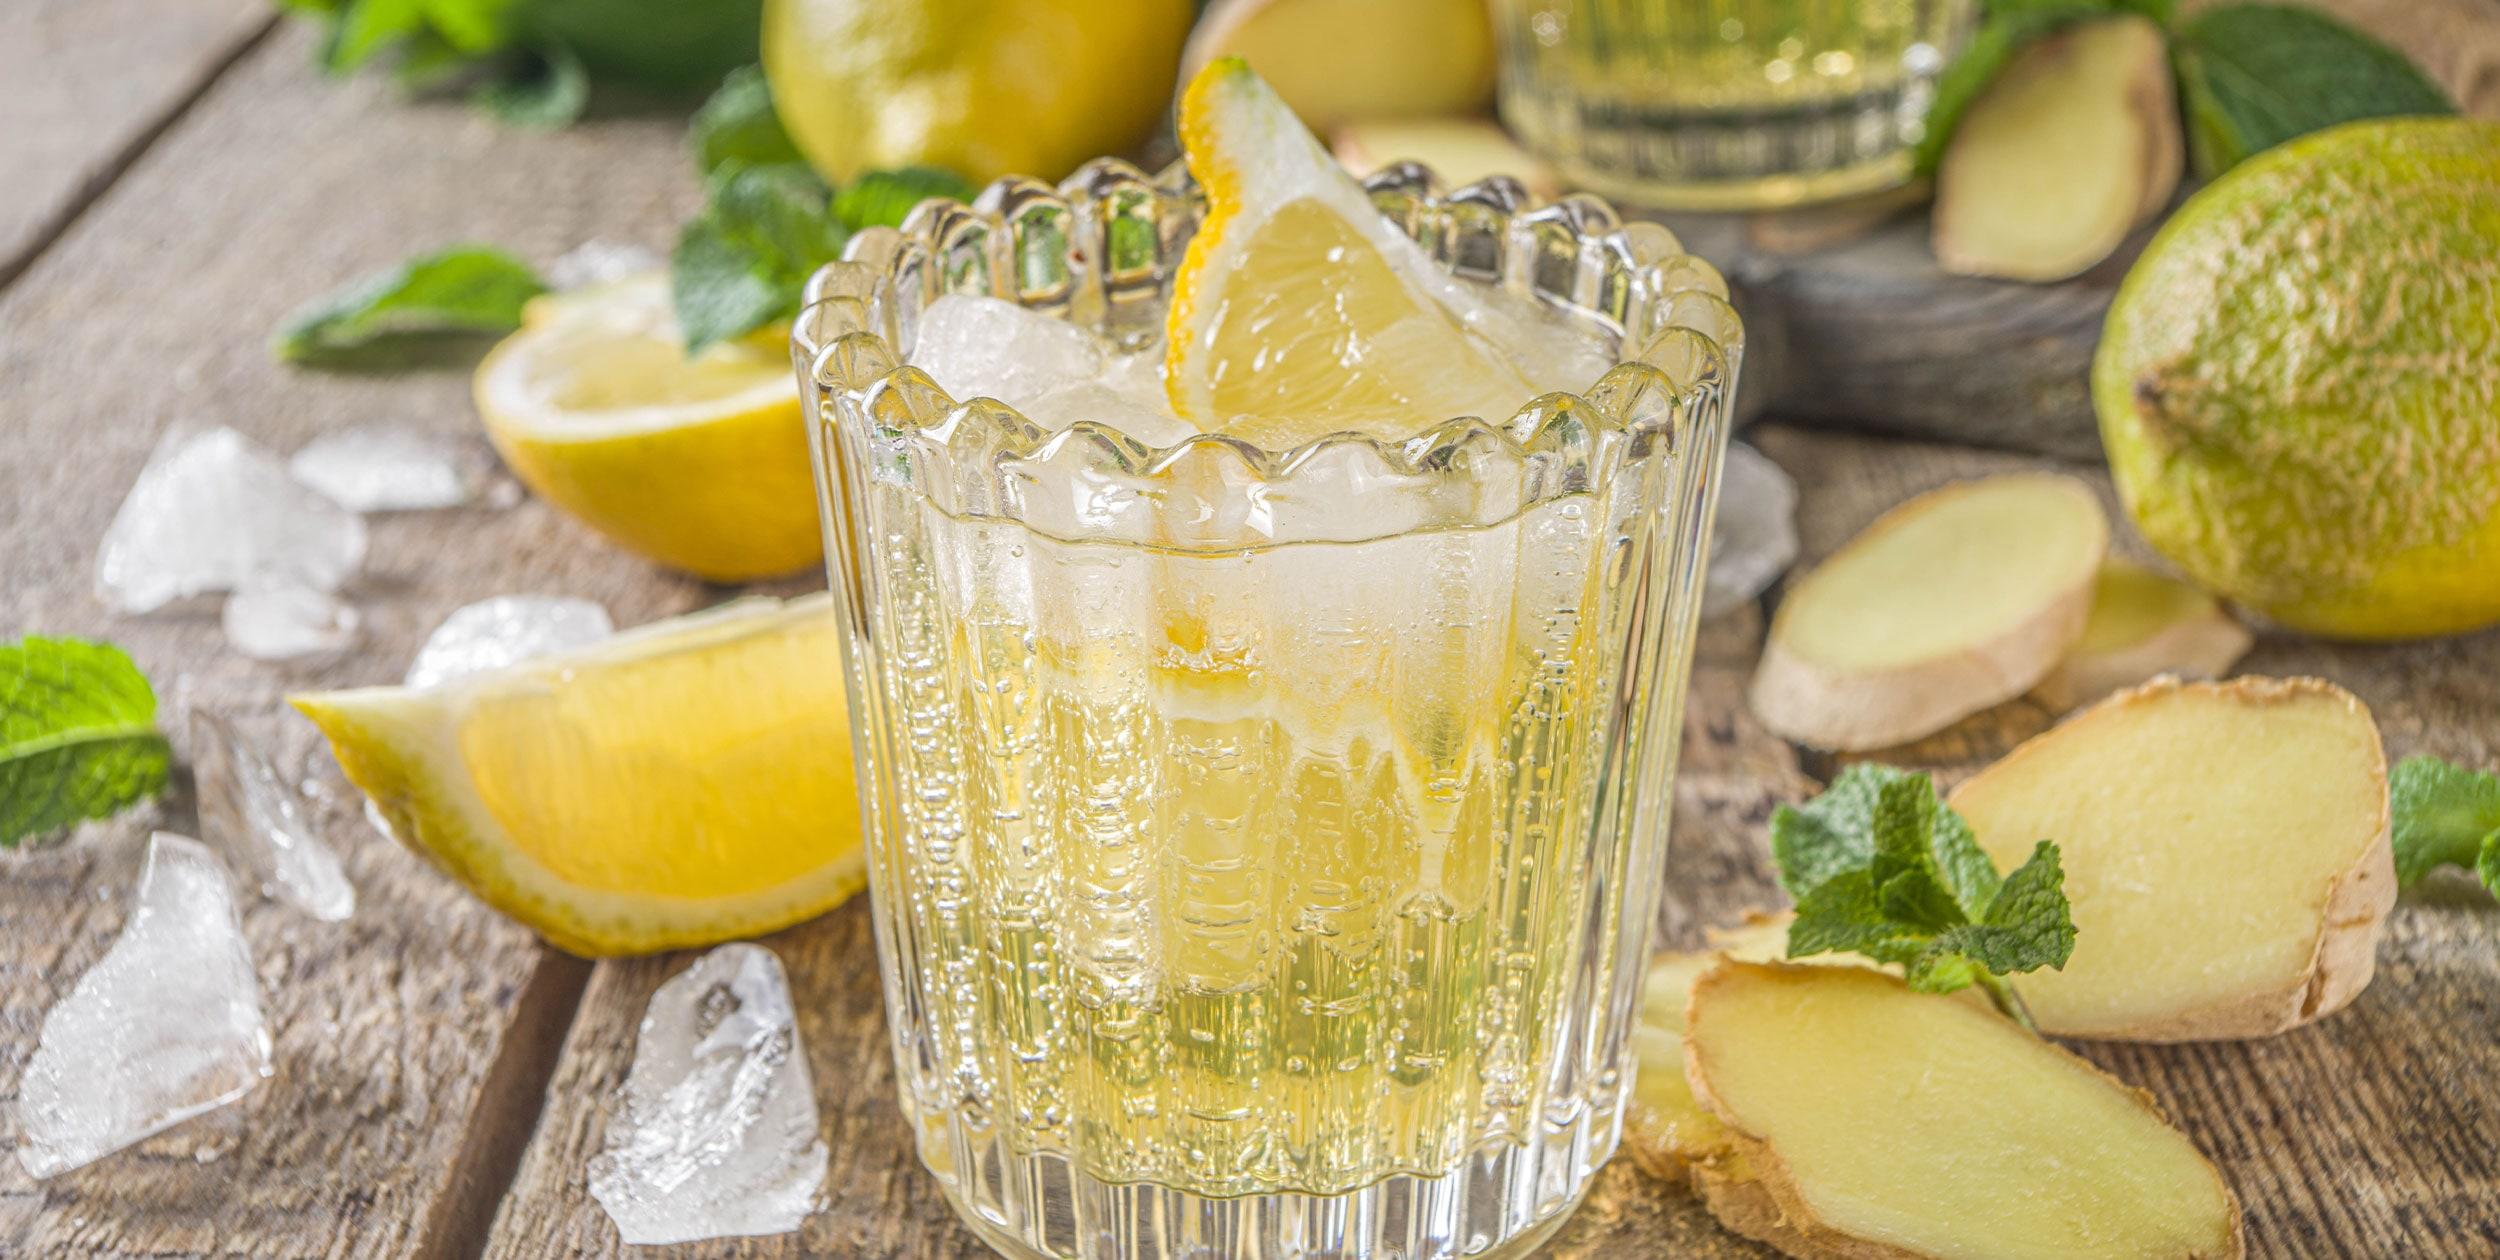 zitronen ingwer limonade rezepte suchen. Black Bedroom Furniture Sets. Home Design Ideas